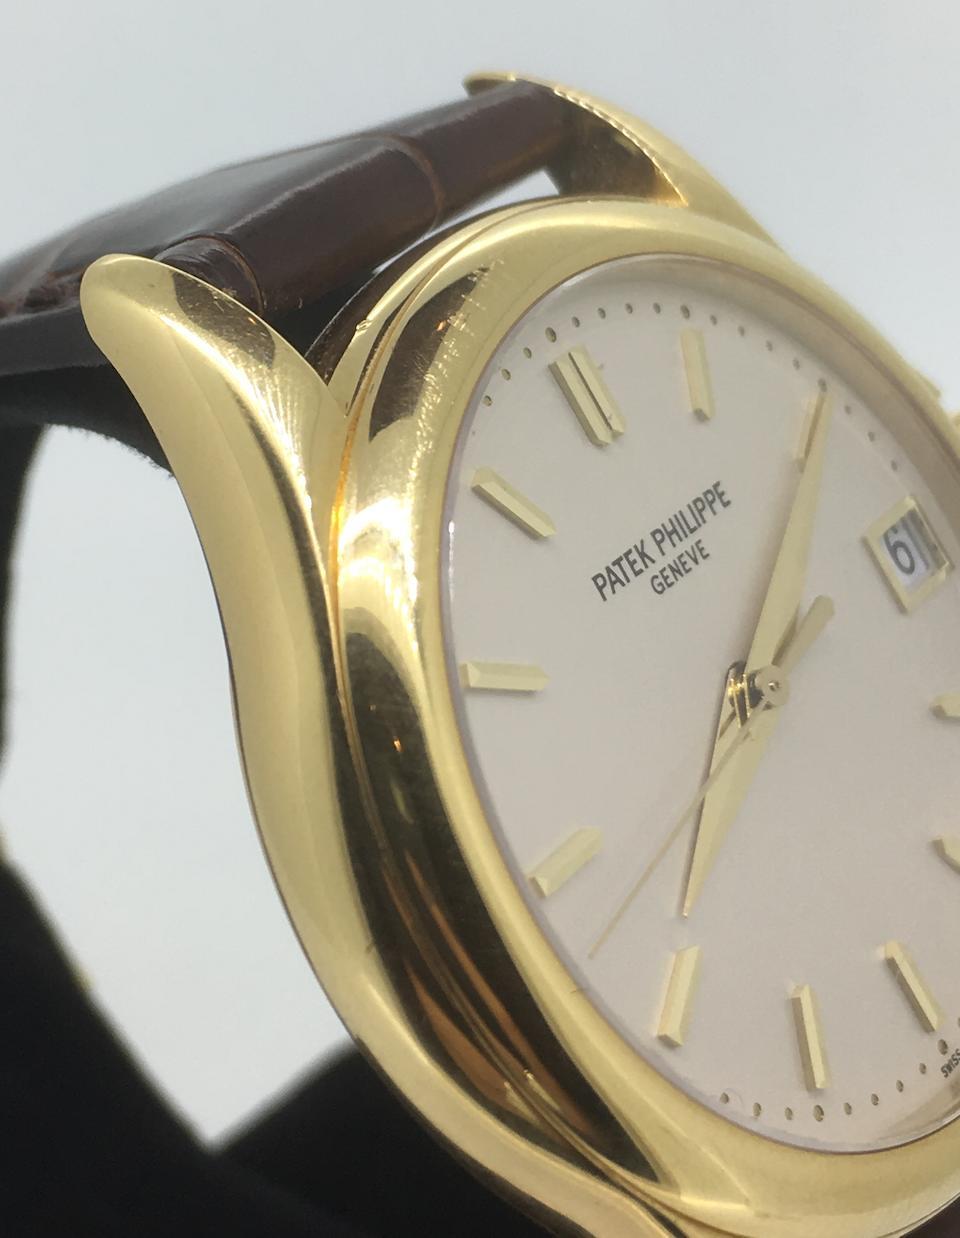 Bonhams Patek Philippe An 18k Gold Automatic Calendar Wristwatch